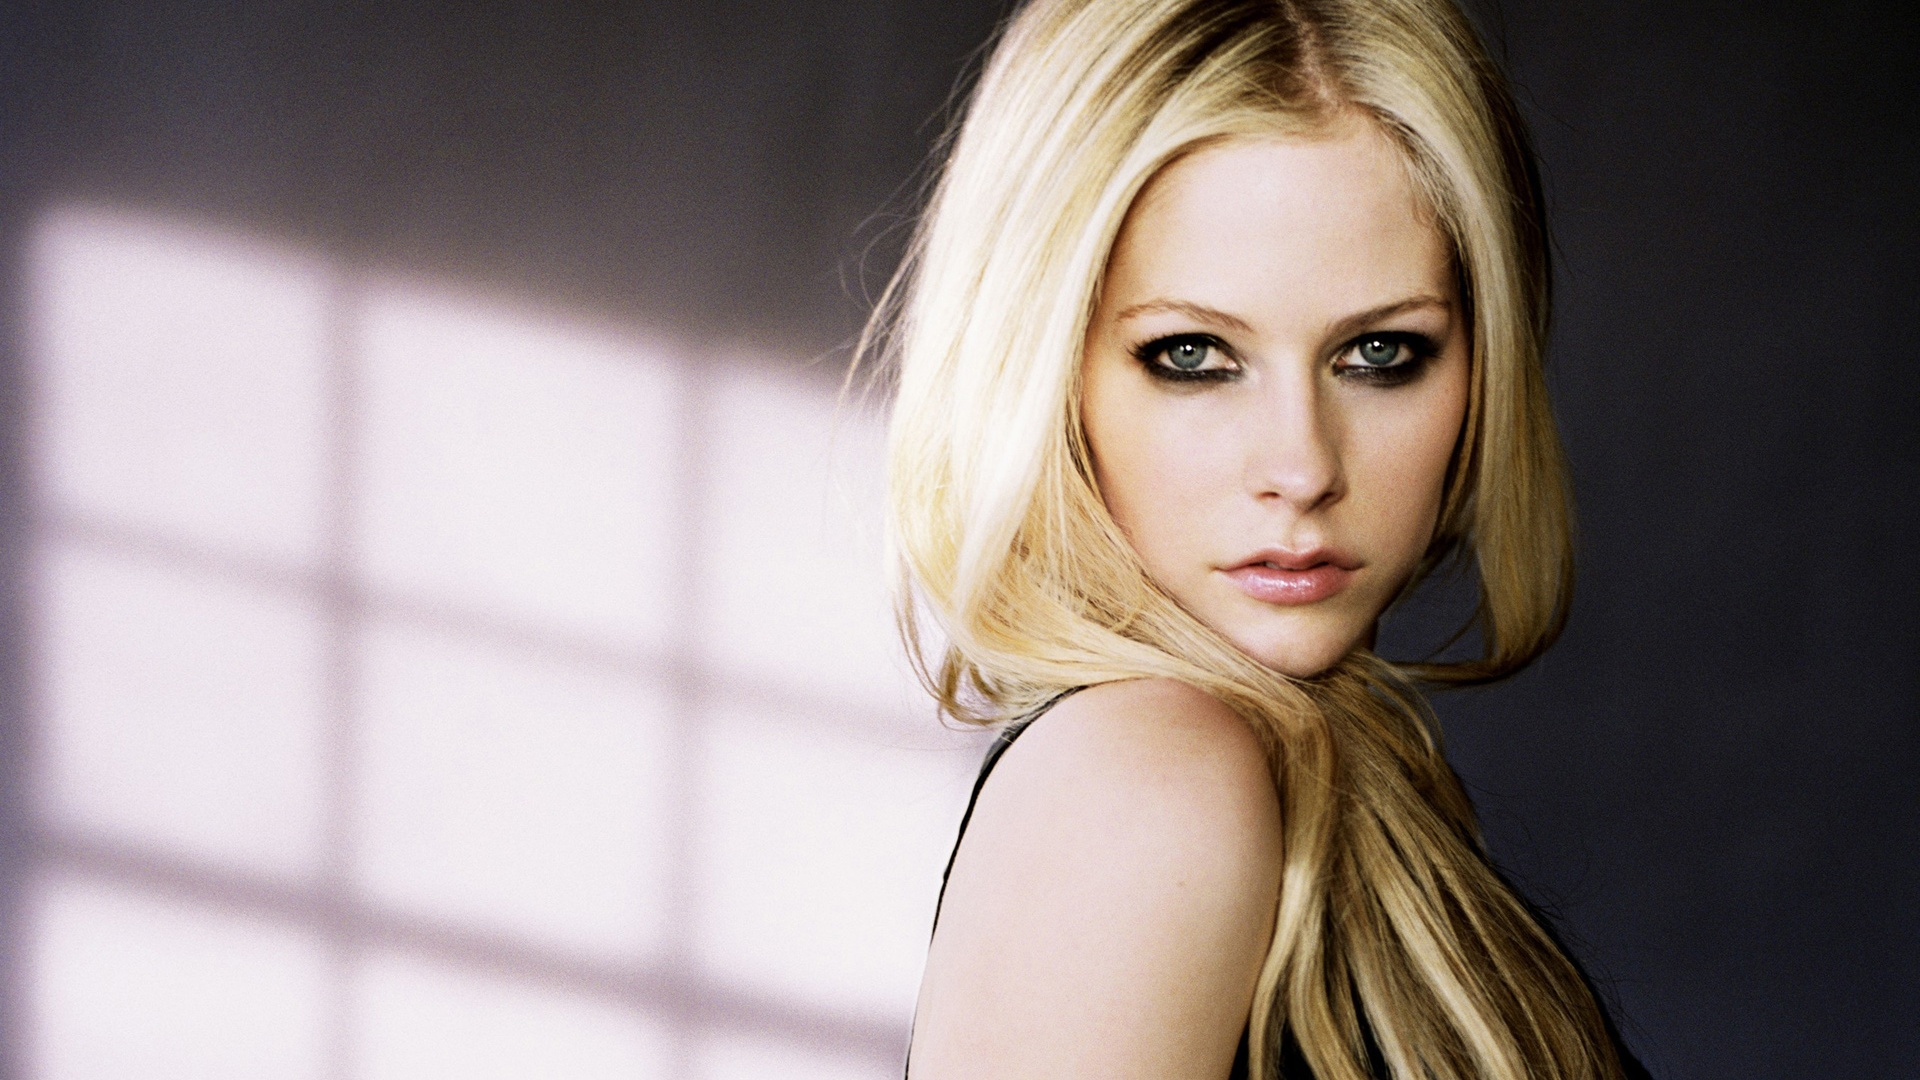 Avril Lavigne Portrait Full HD Desktop Wallpapers 1080p 1920x1080